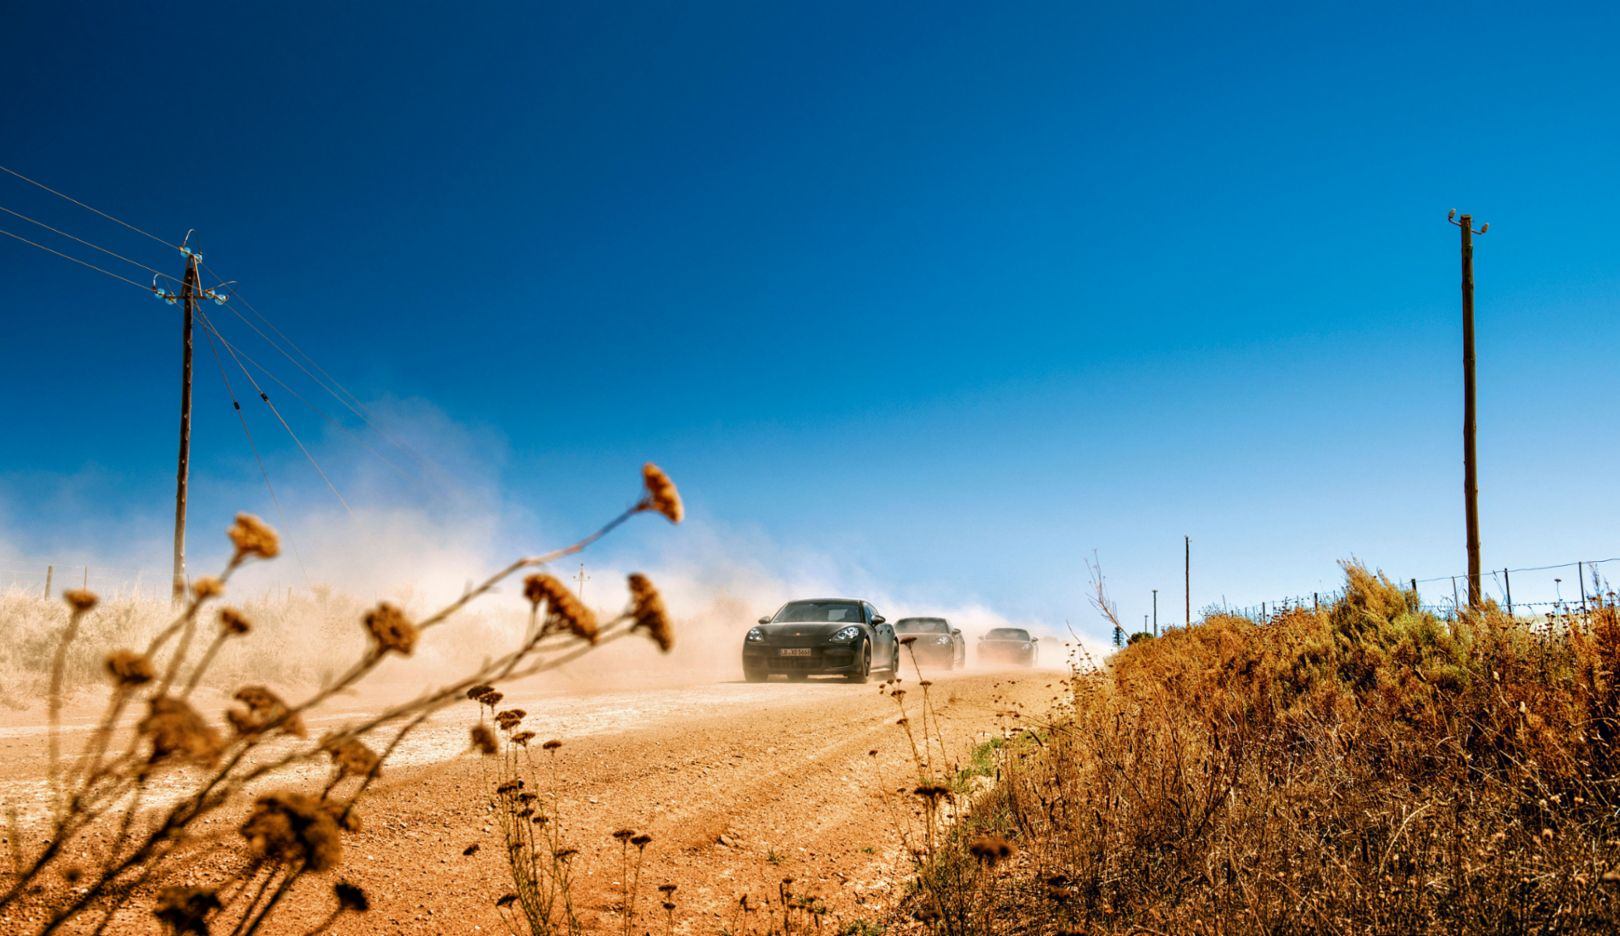 Panamera, South Africa, 2016, Porsche AG